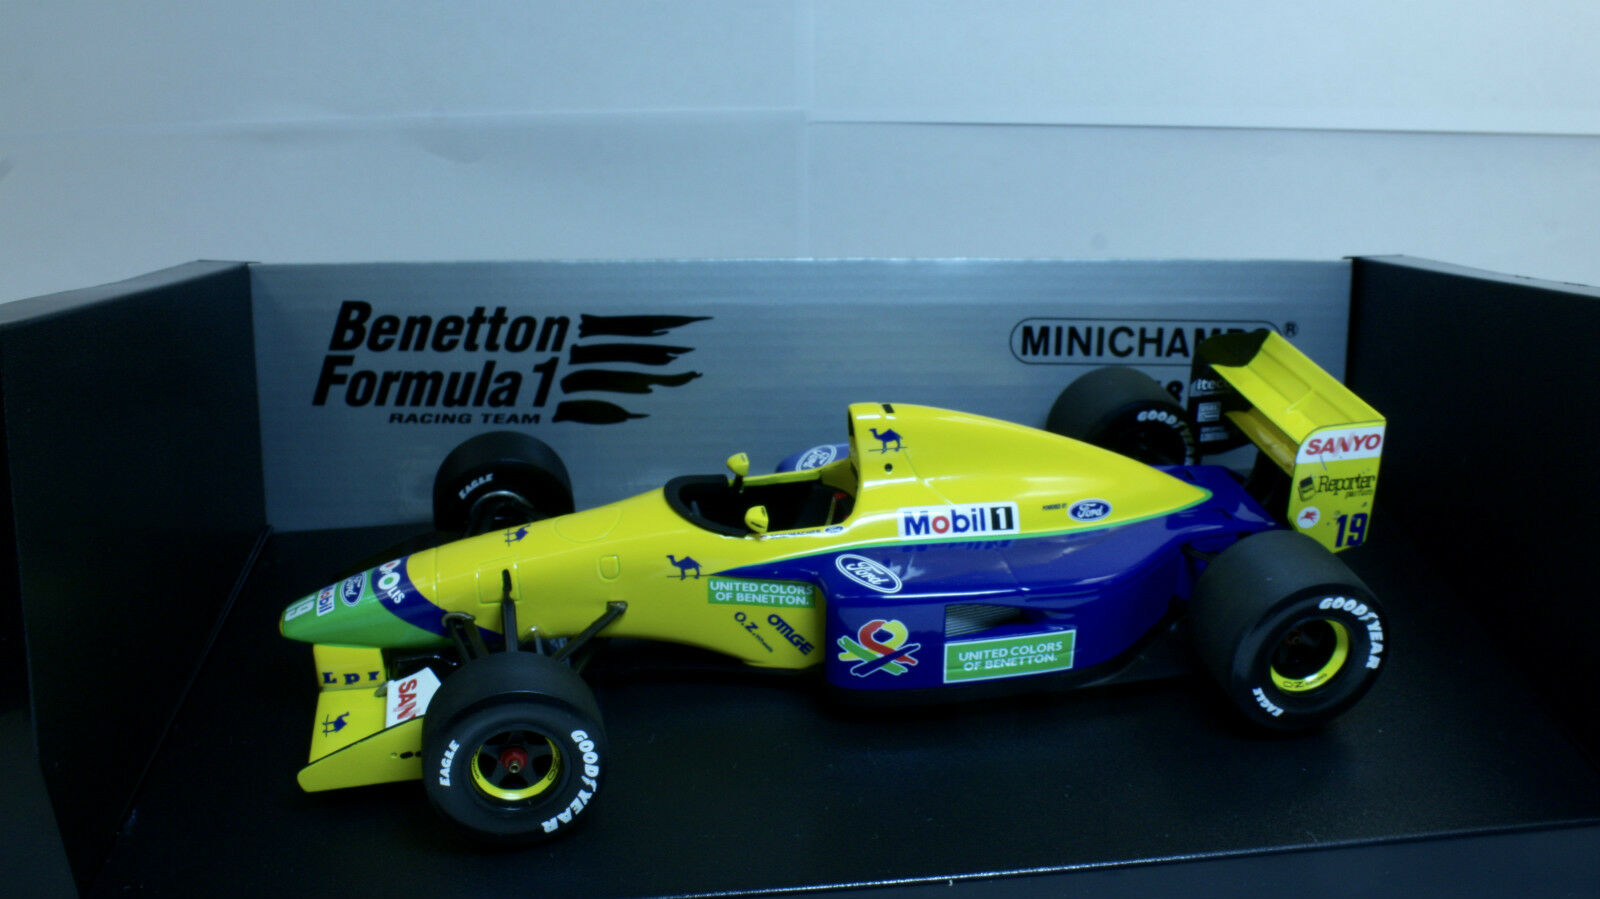 F1 BENETTON Ford B191 M Schumacher 2018 Minichamps  100920189